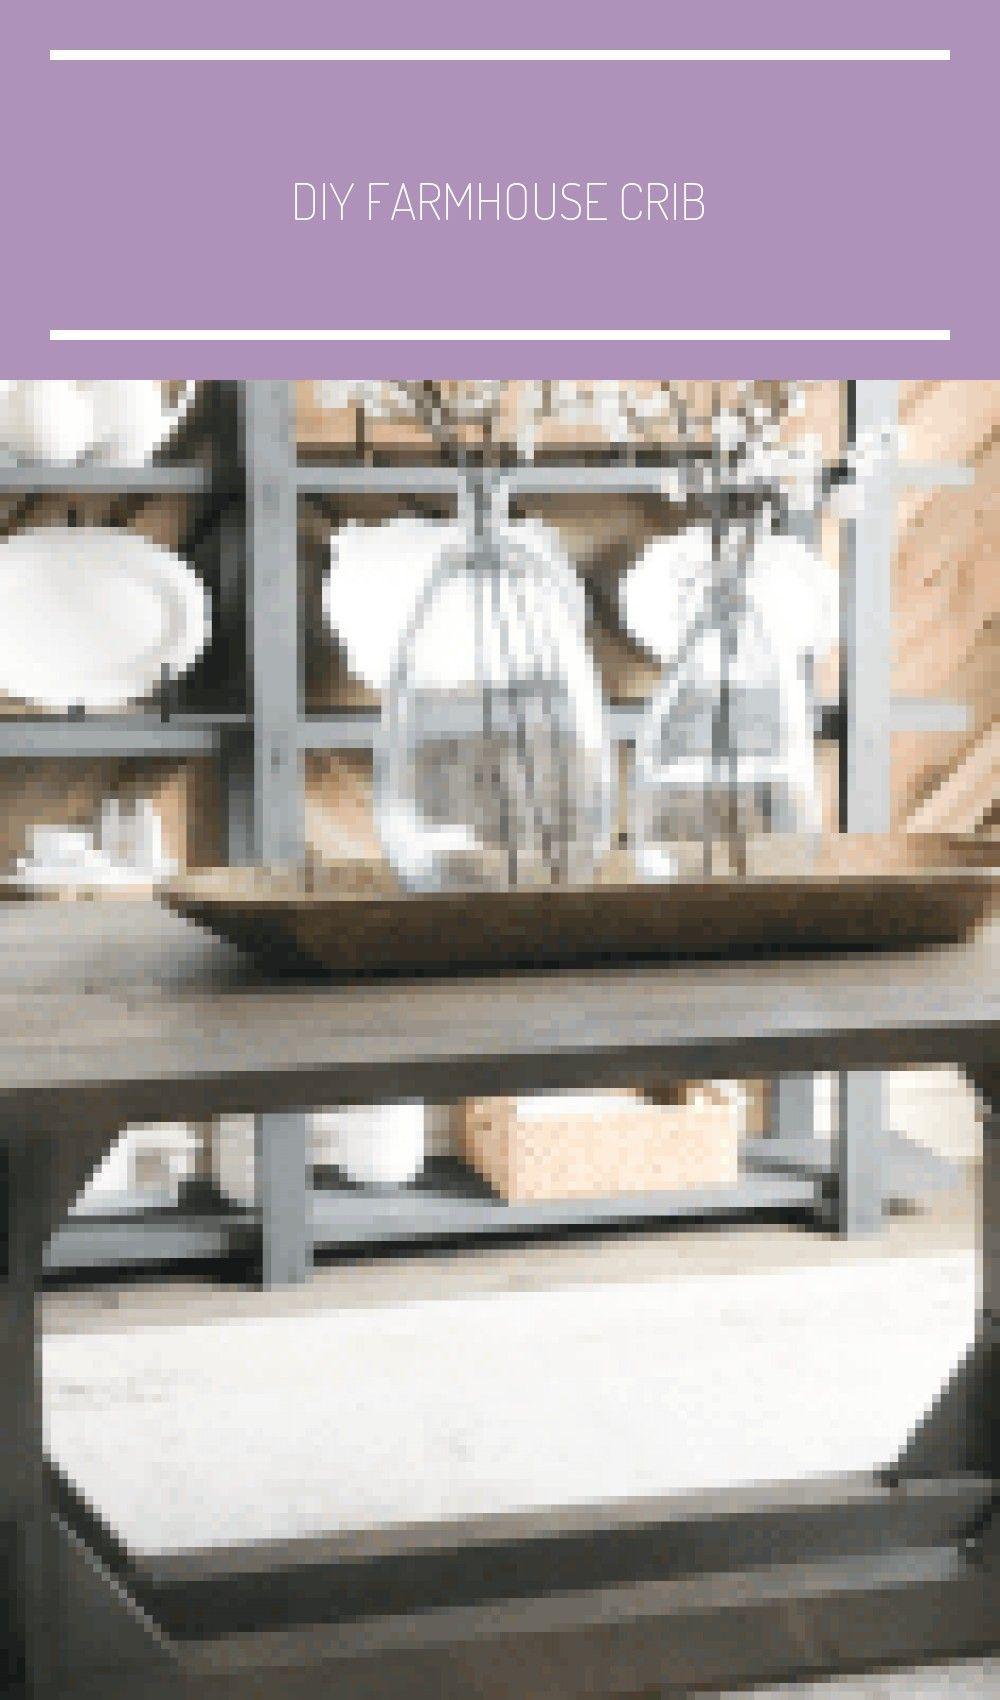 Diy farmhouse crib free tutorial and plans shanty 2